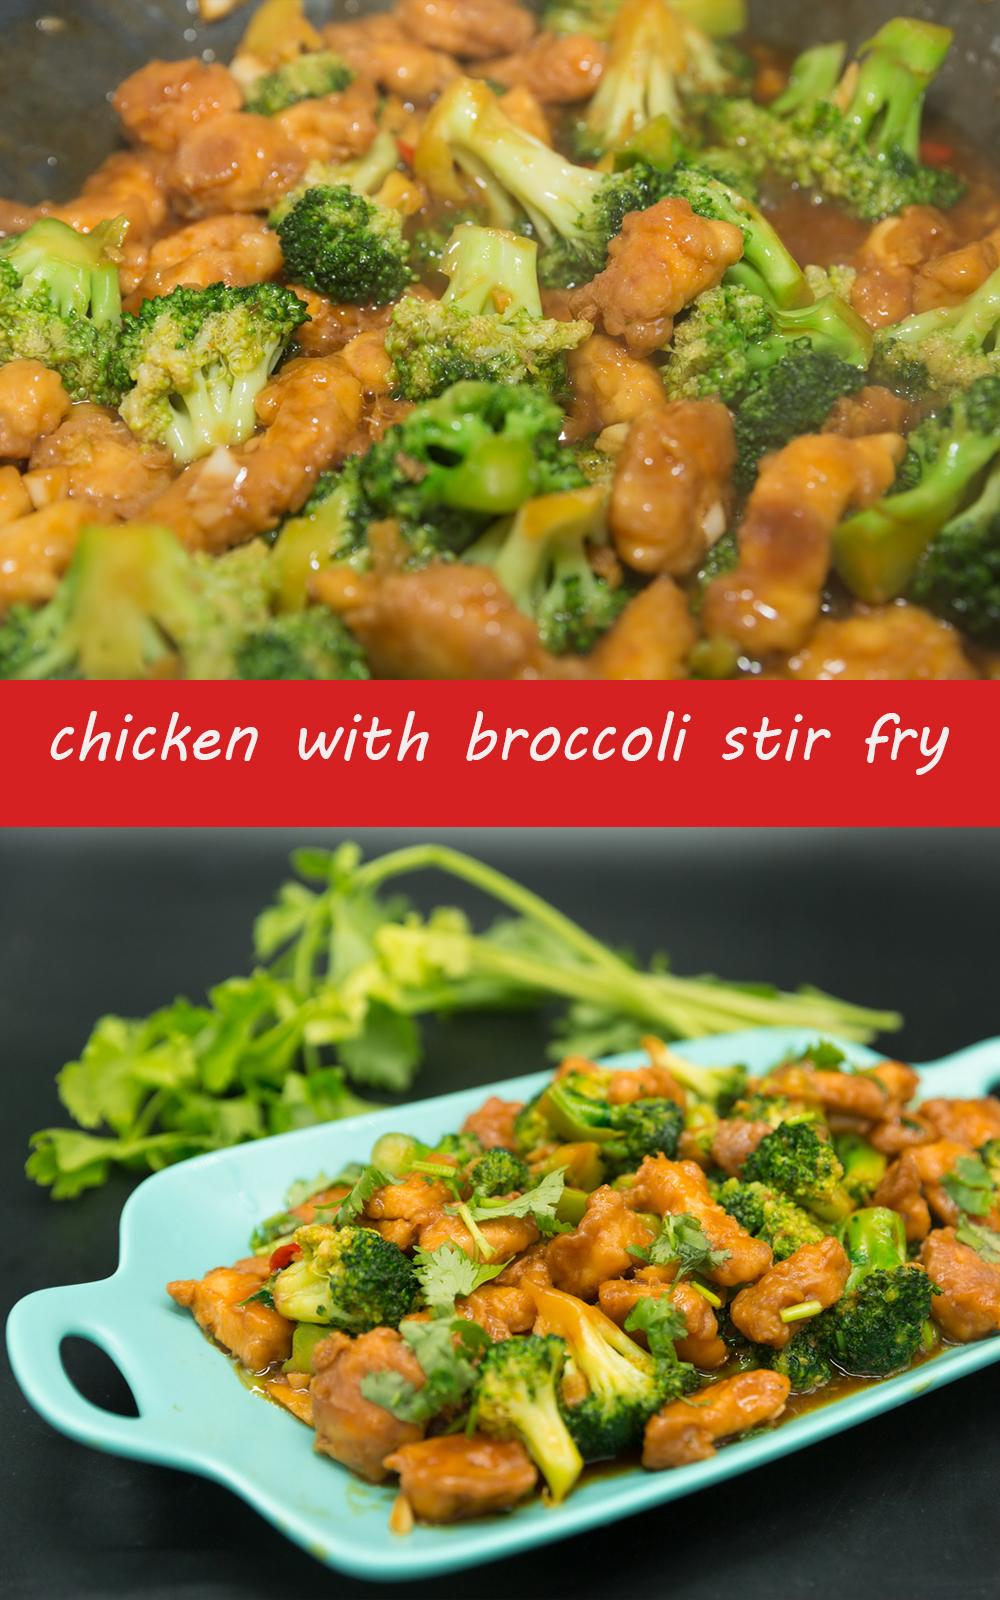 chicken with broccoli stir fry recipes